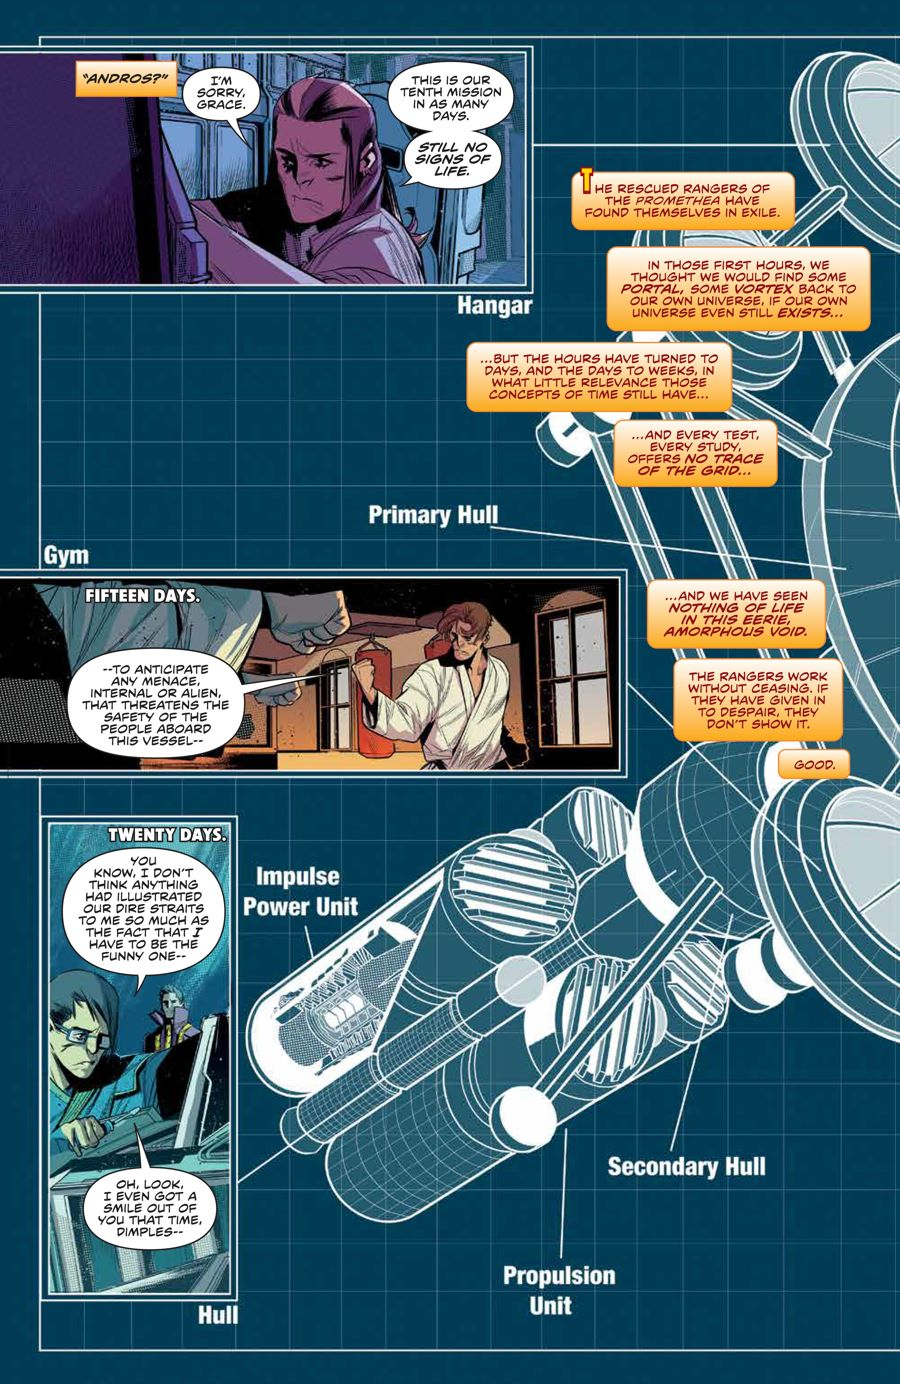 MMPR_BeyondGrid_SC_PRESS_18 ComicList Previews: MIGHTY MORPHIN POWER RANGERS BEYOND THE GRID TP